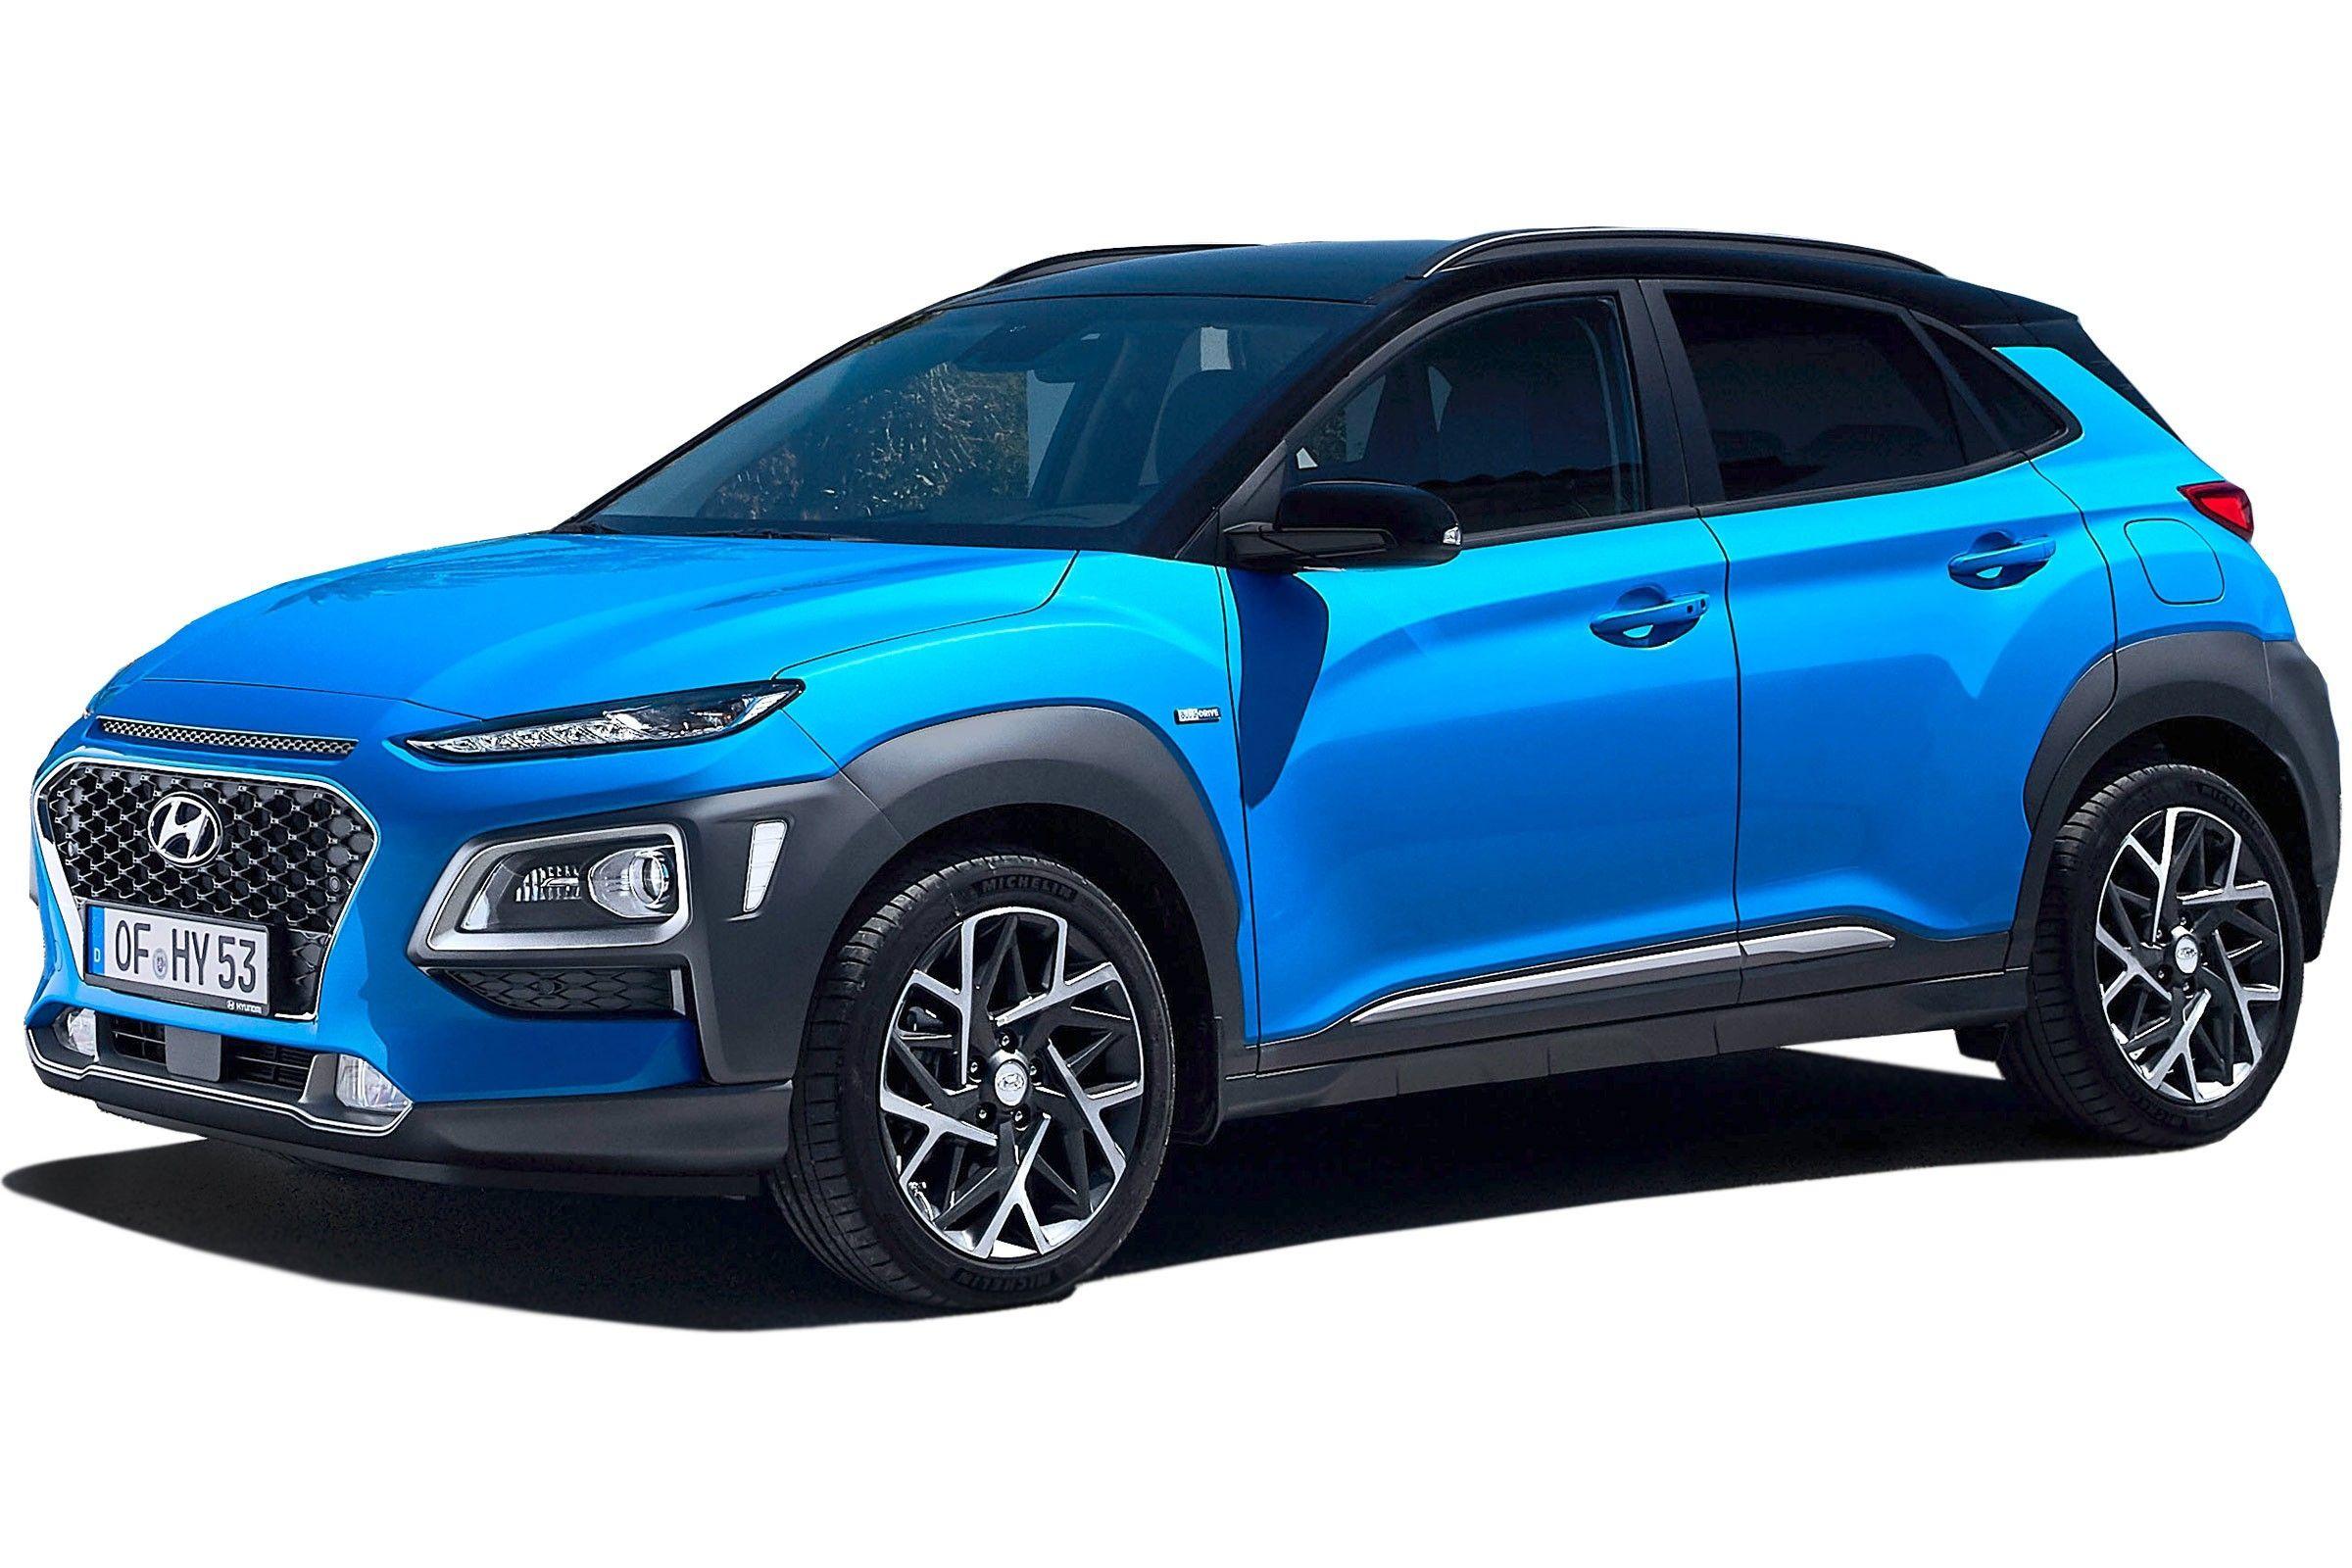 Hyundai Hybrid Suv 2020 Release Date in 2020 Hyundai